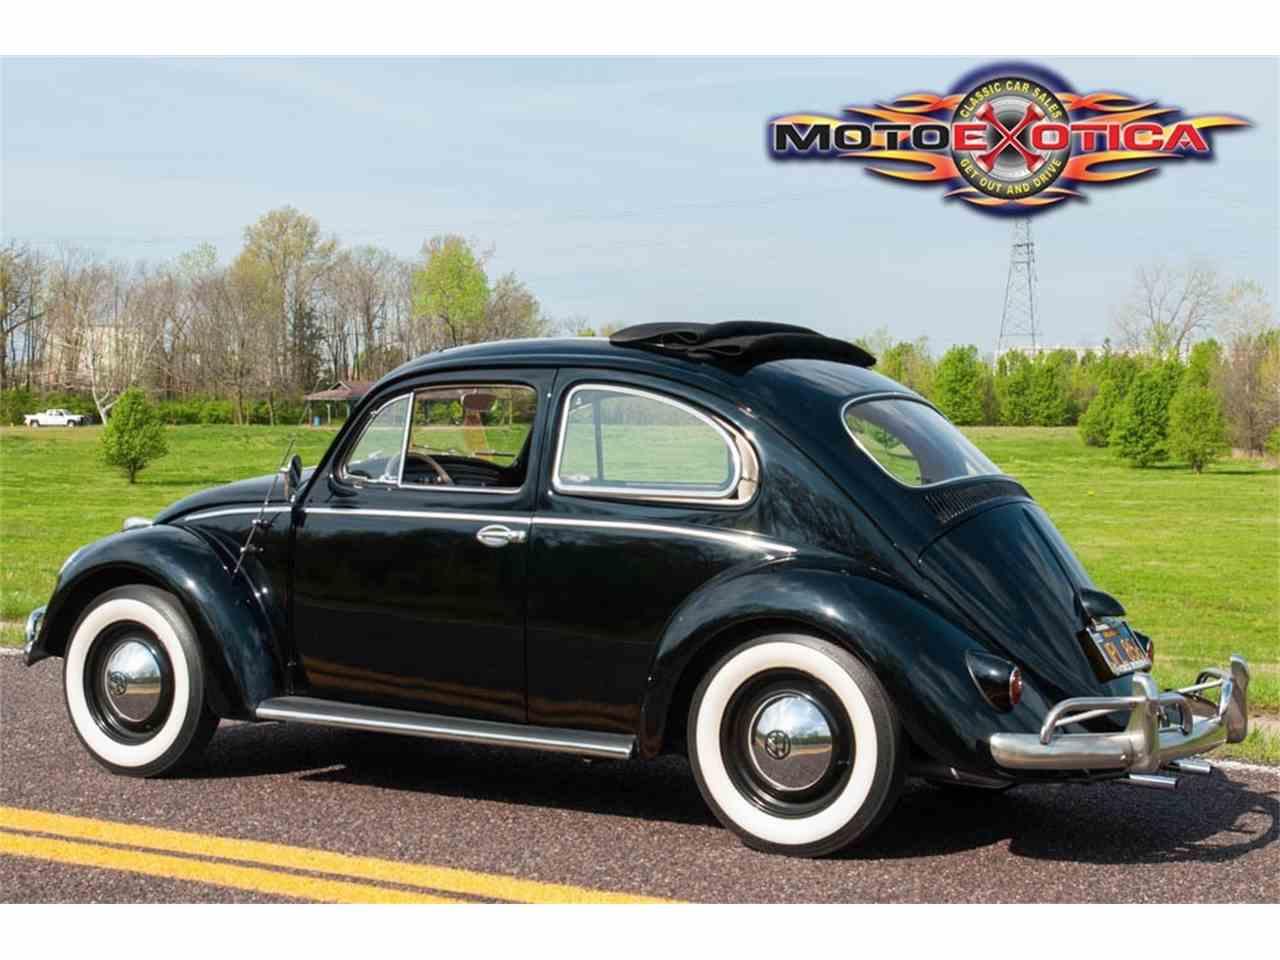 1958 Volkswagen Beetle for Sale | ClassicCars.com | CC-1070119